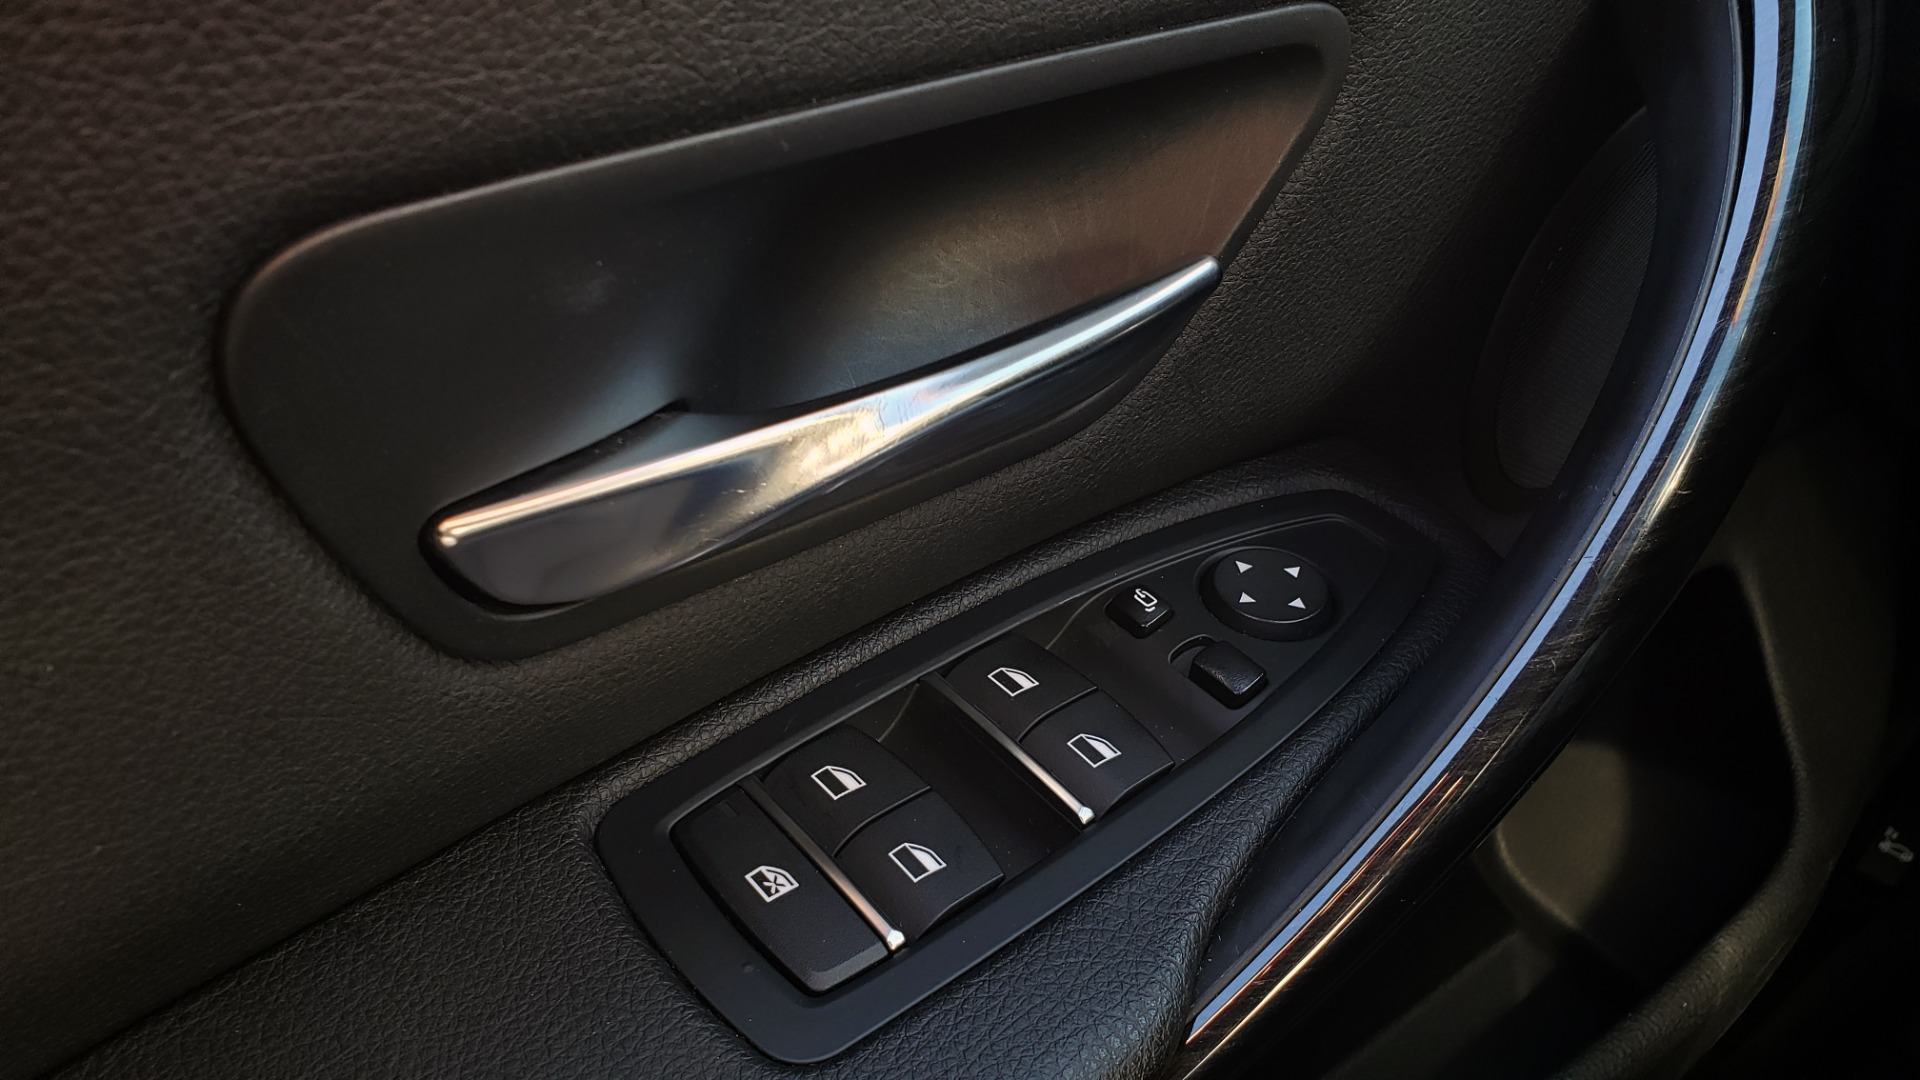 Used 2018 BMW 4 SERIES 430IXDRIVE / PREMIUM / NAV / SUNROOF / ESSENTIALS PKG for sale $28,995 at Formula Imports in Charlotte NC 28227 37